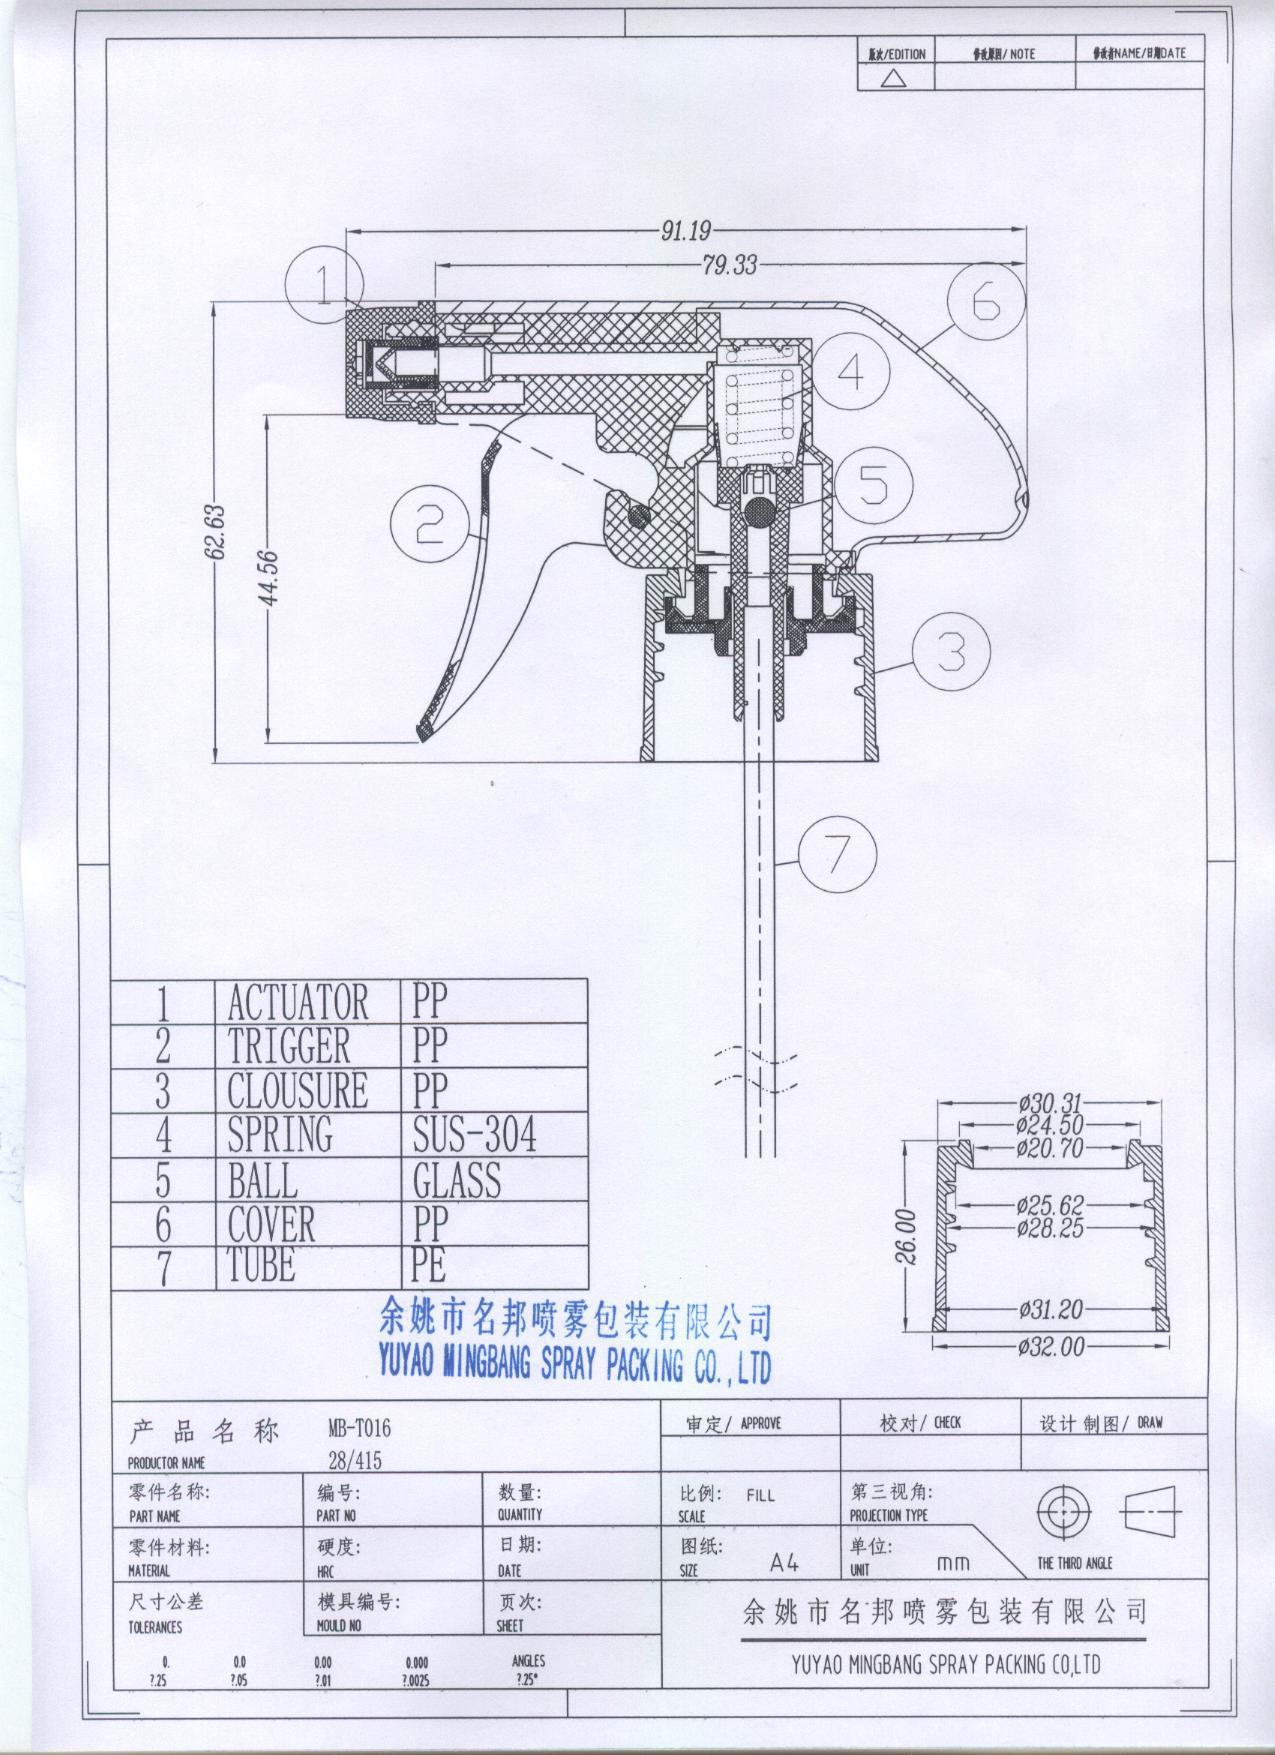 PP Plastic 28/415 Sprayer Trigger